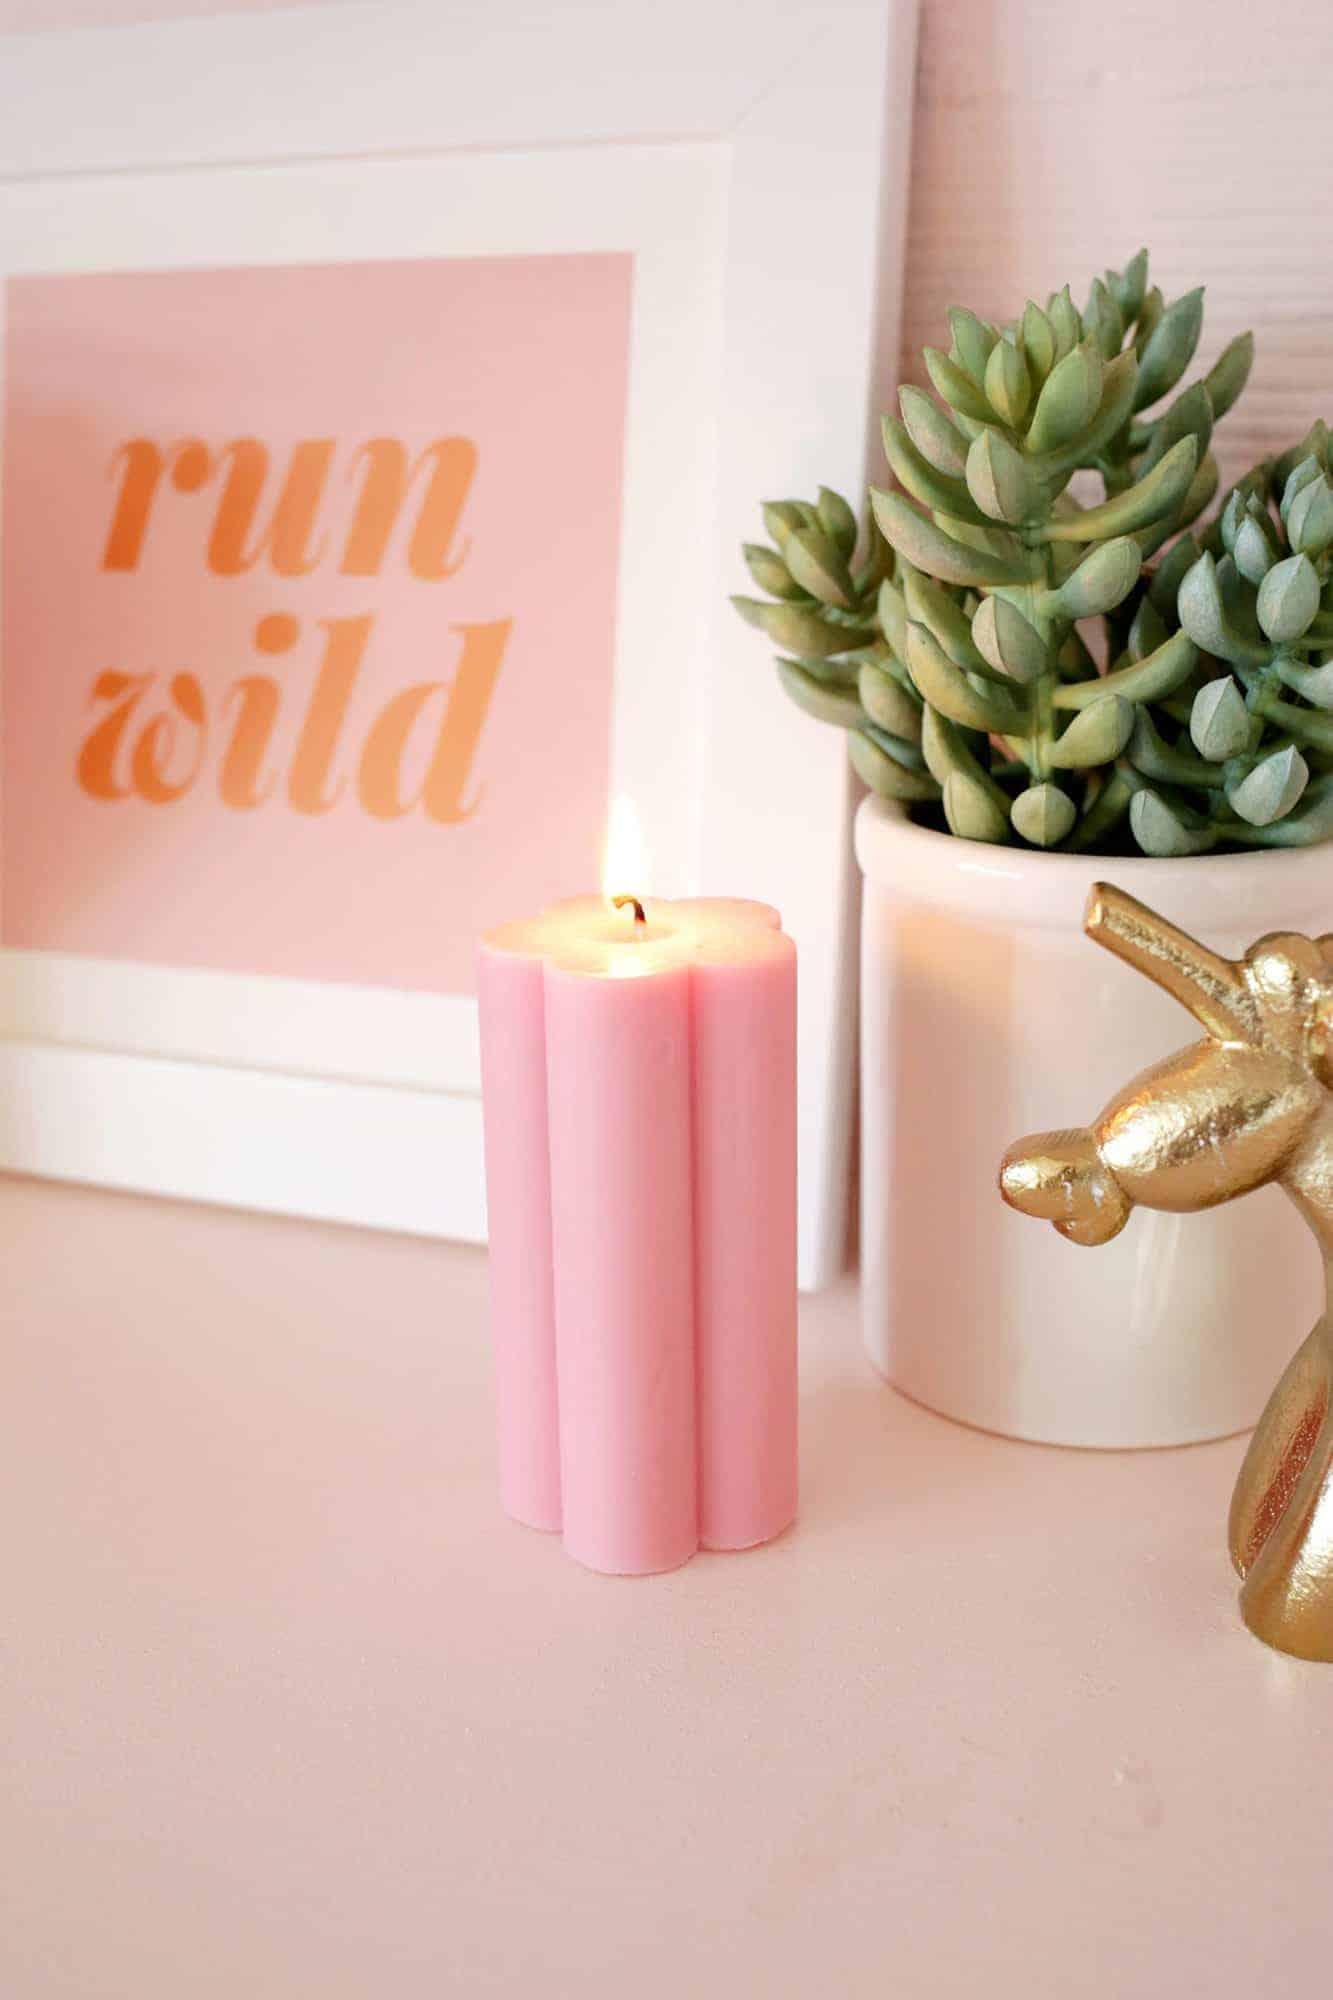 Flower pillar candle DIY